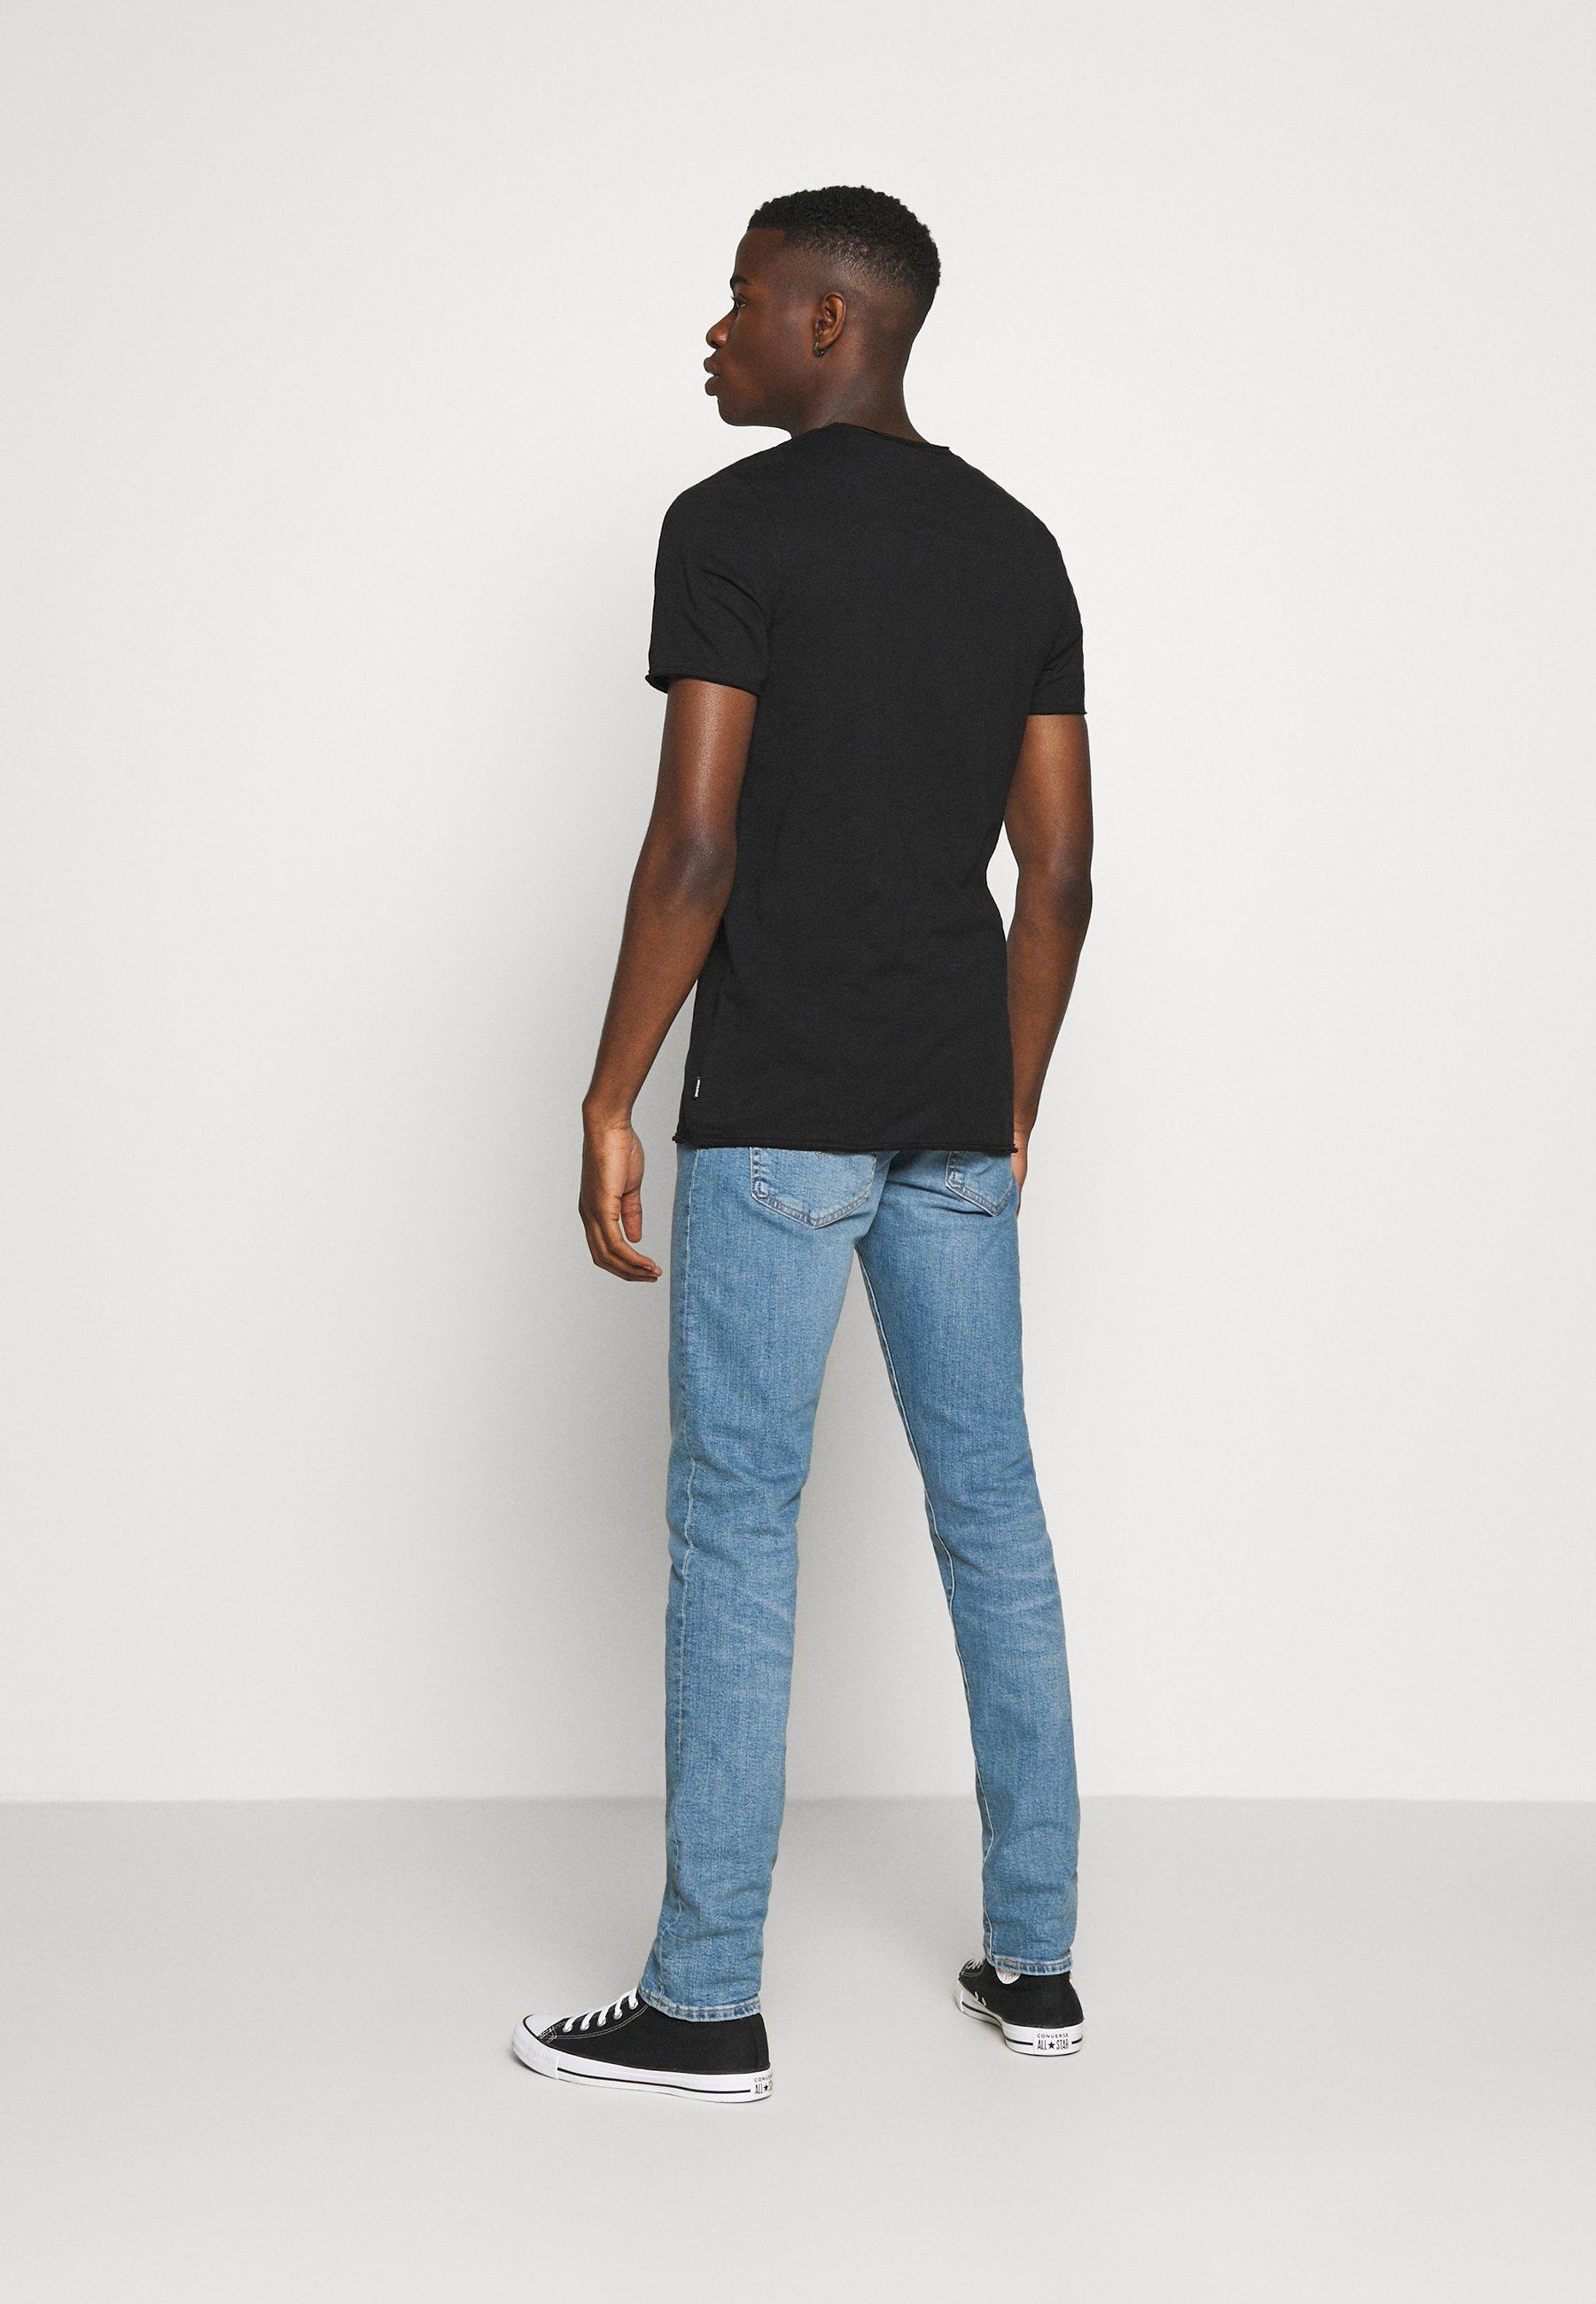 Jack & Jones JJDETAIL TEE U NECK - Basic T-shirt - black kZq5n